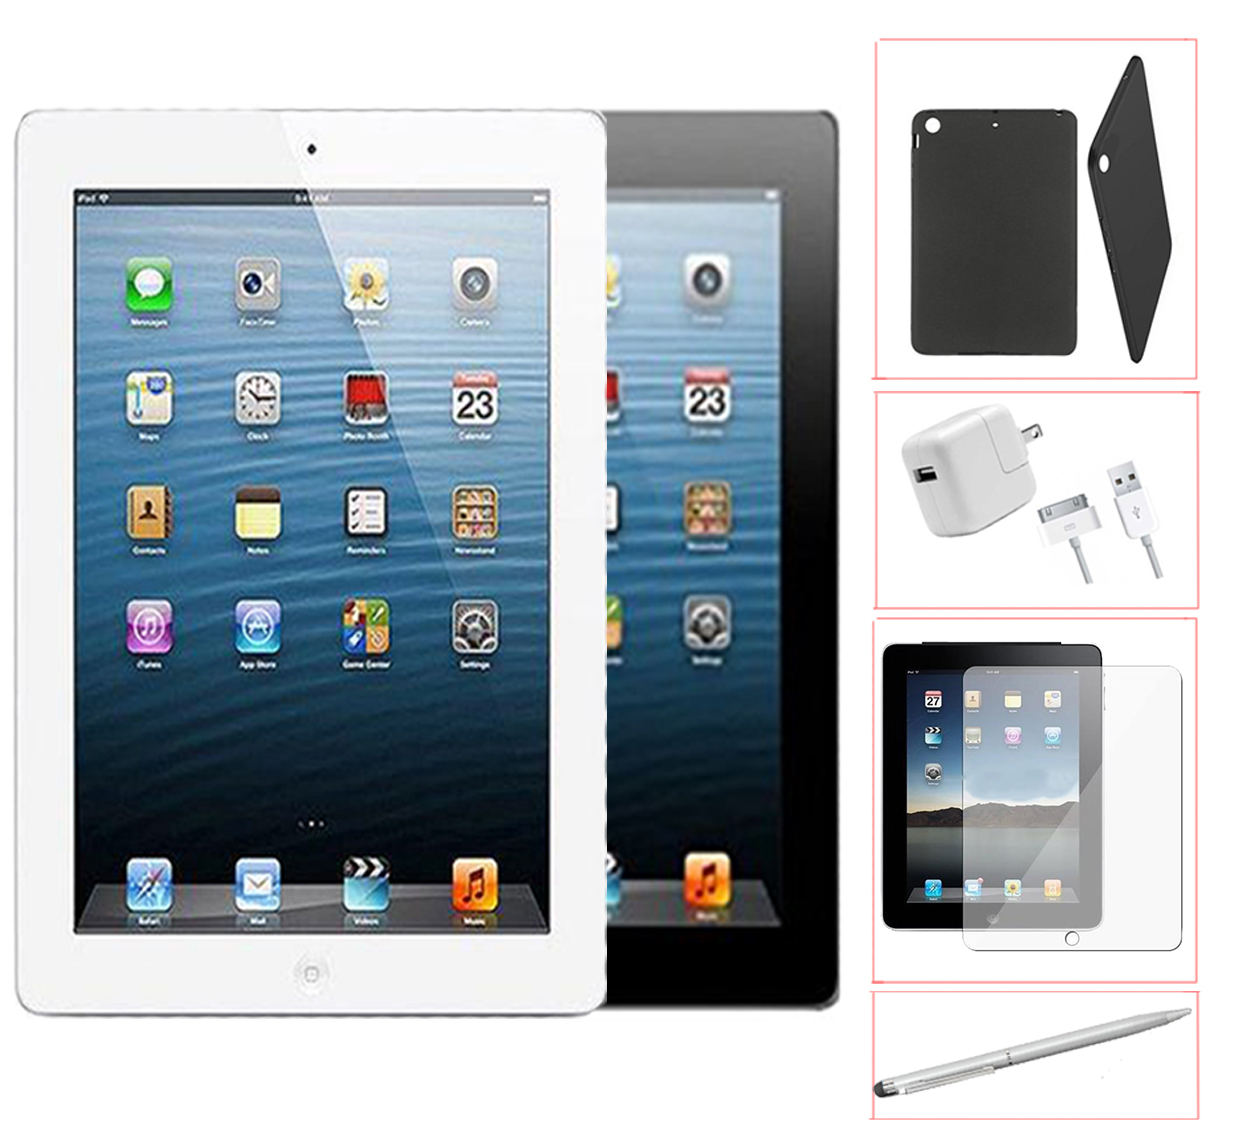 Refurbished Apple iPad 2 16GB Black -WiFi - Bundle - Case, Rapid Charger, Tempered Glass & Stylus Pen